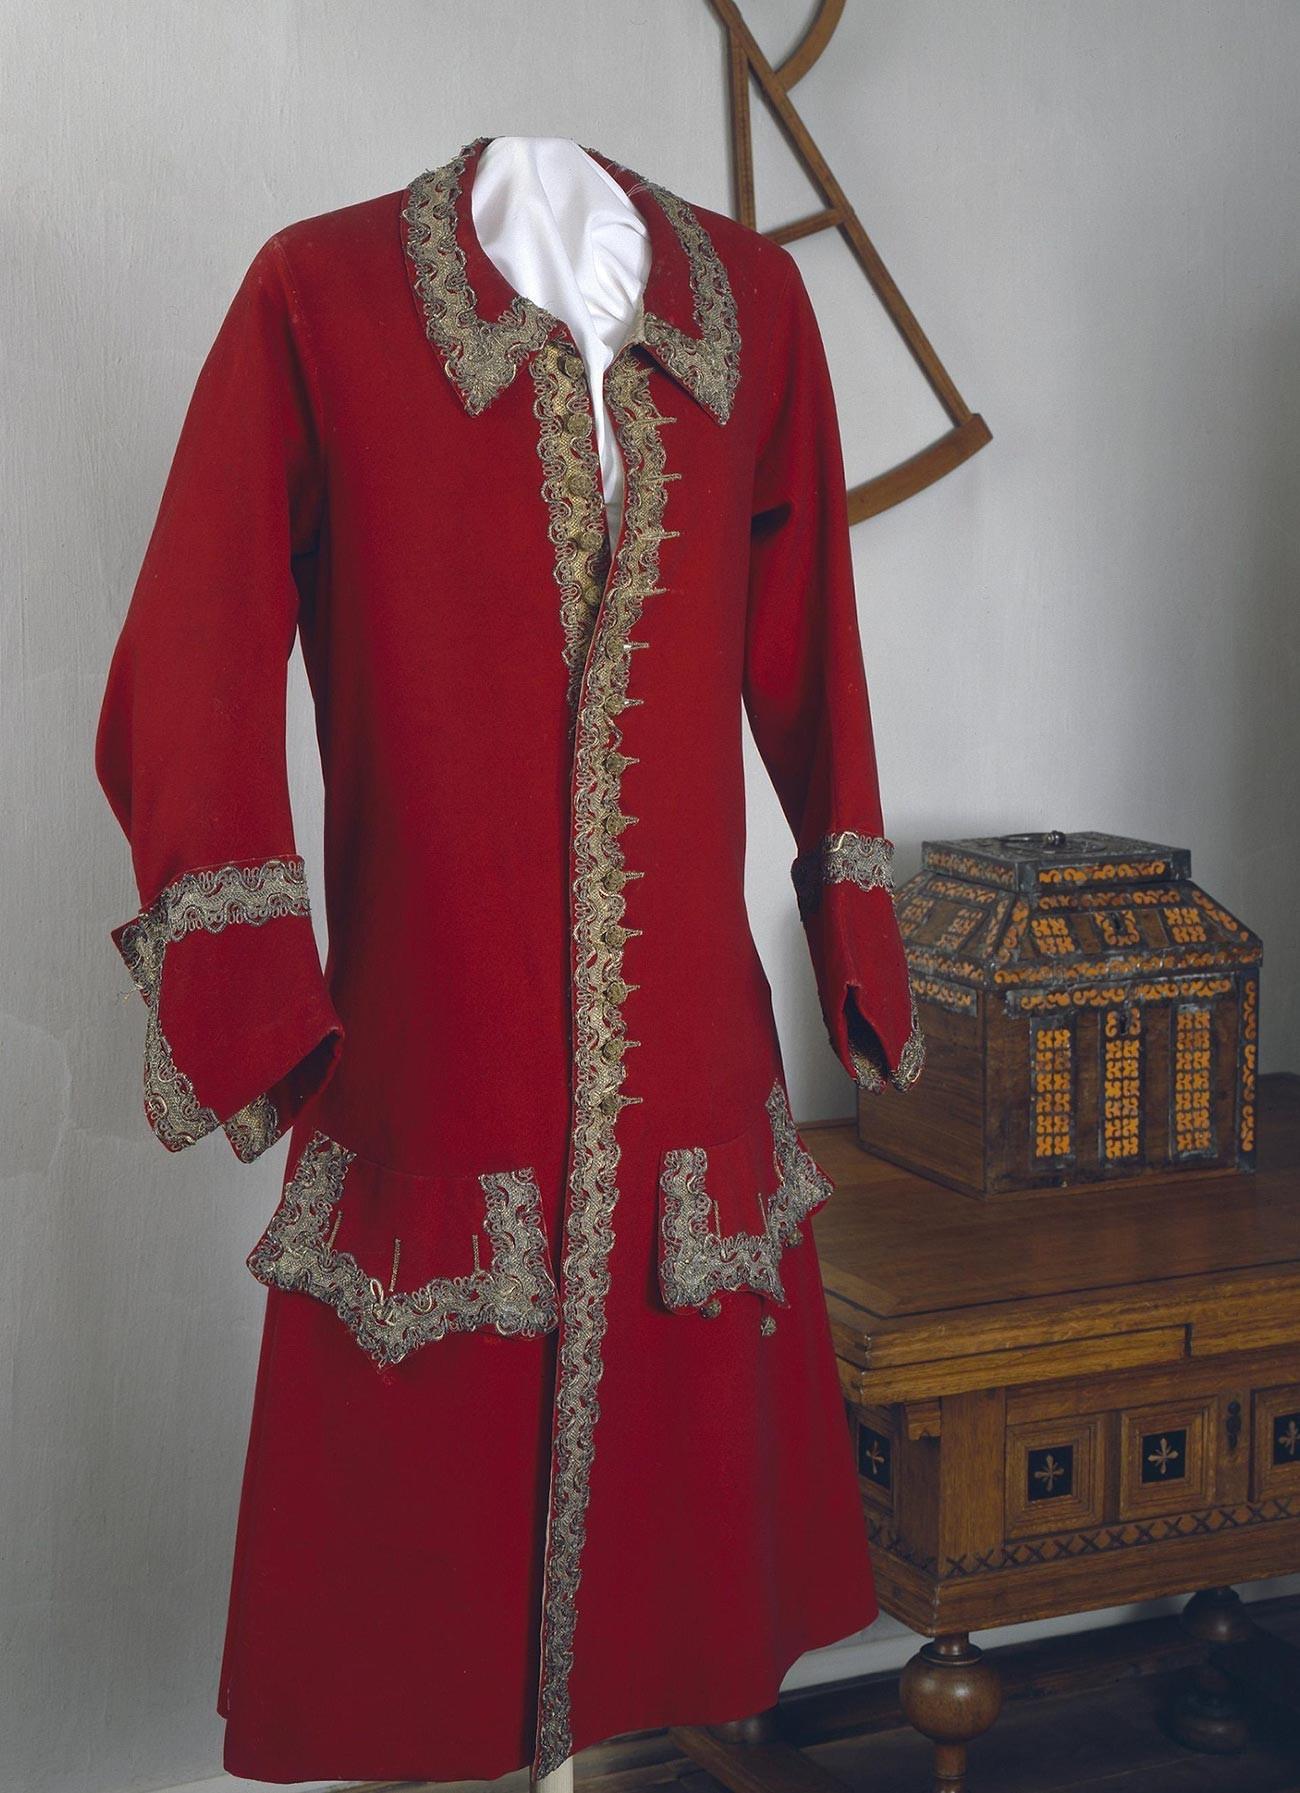 Kaftan (semacam jaket) seremonial Pyotr yang Agung.